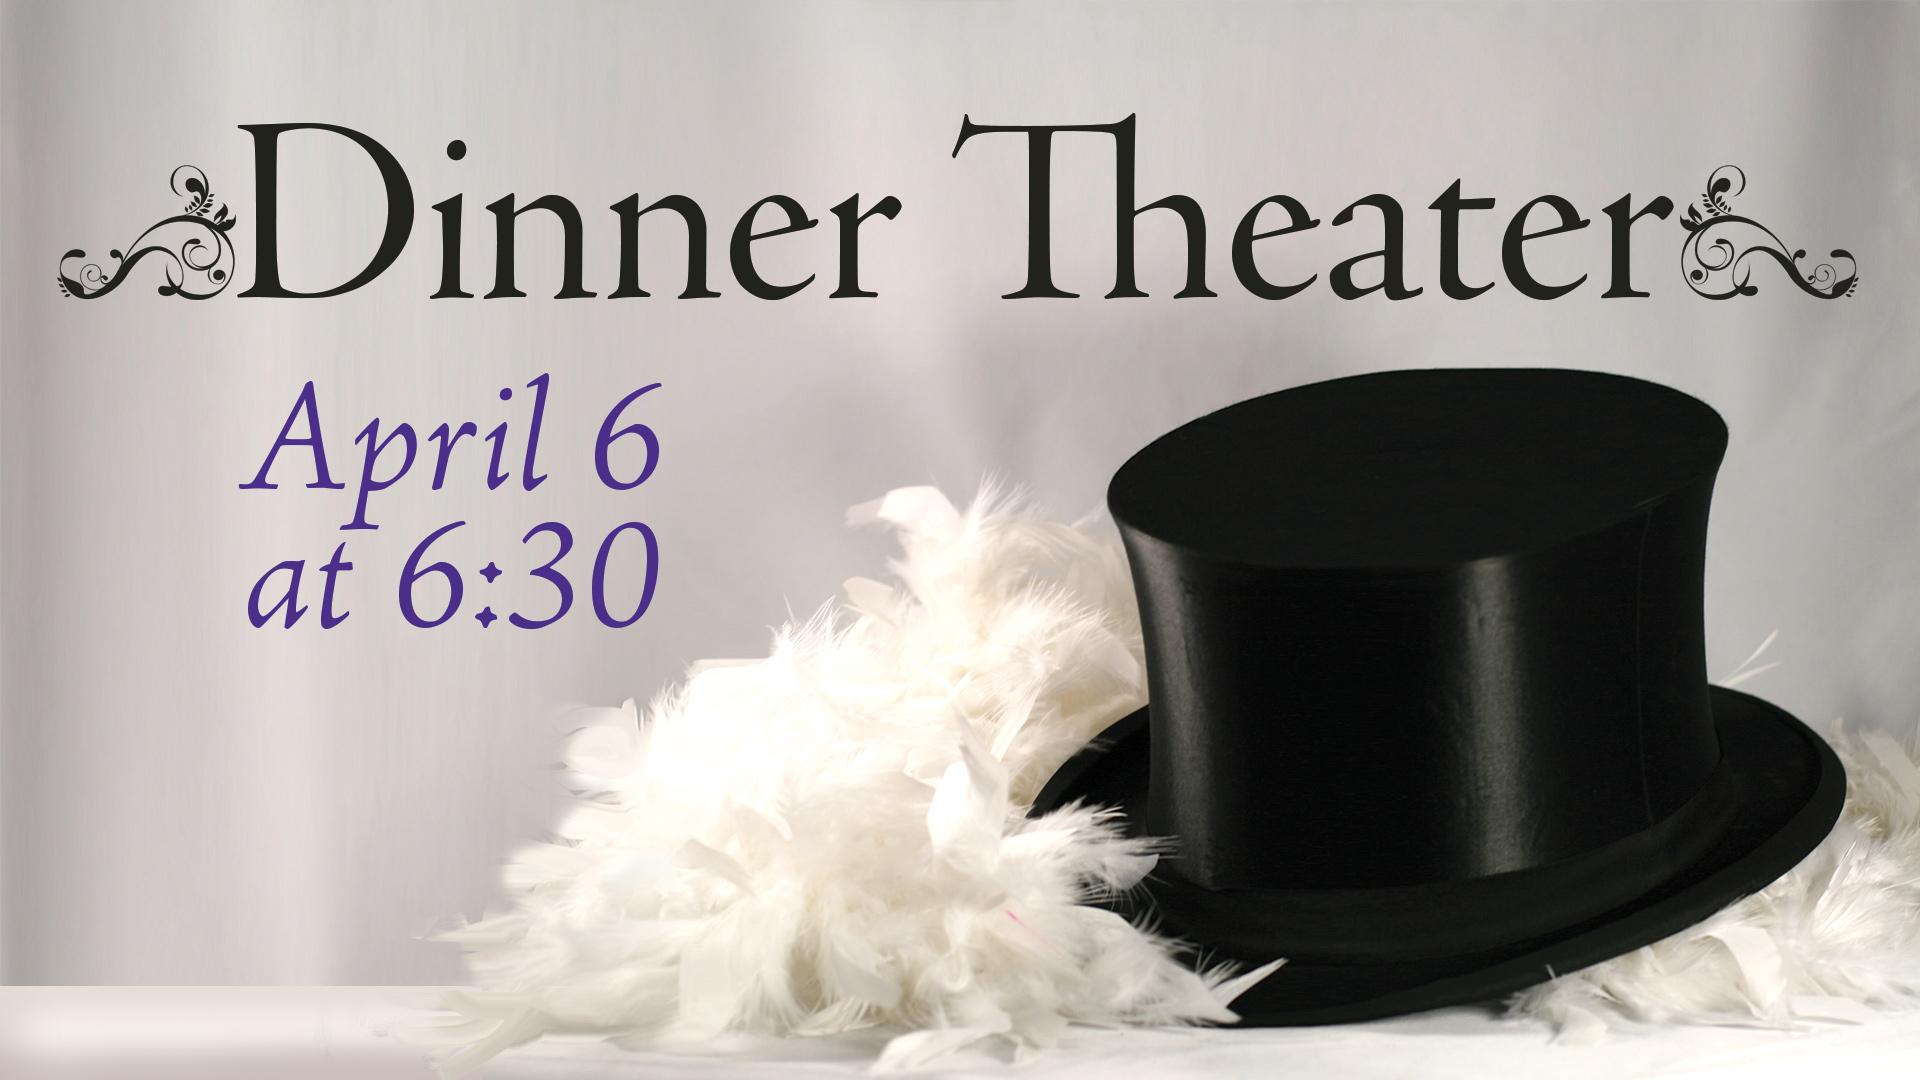 2 dinner theater